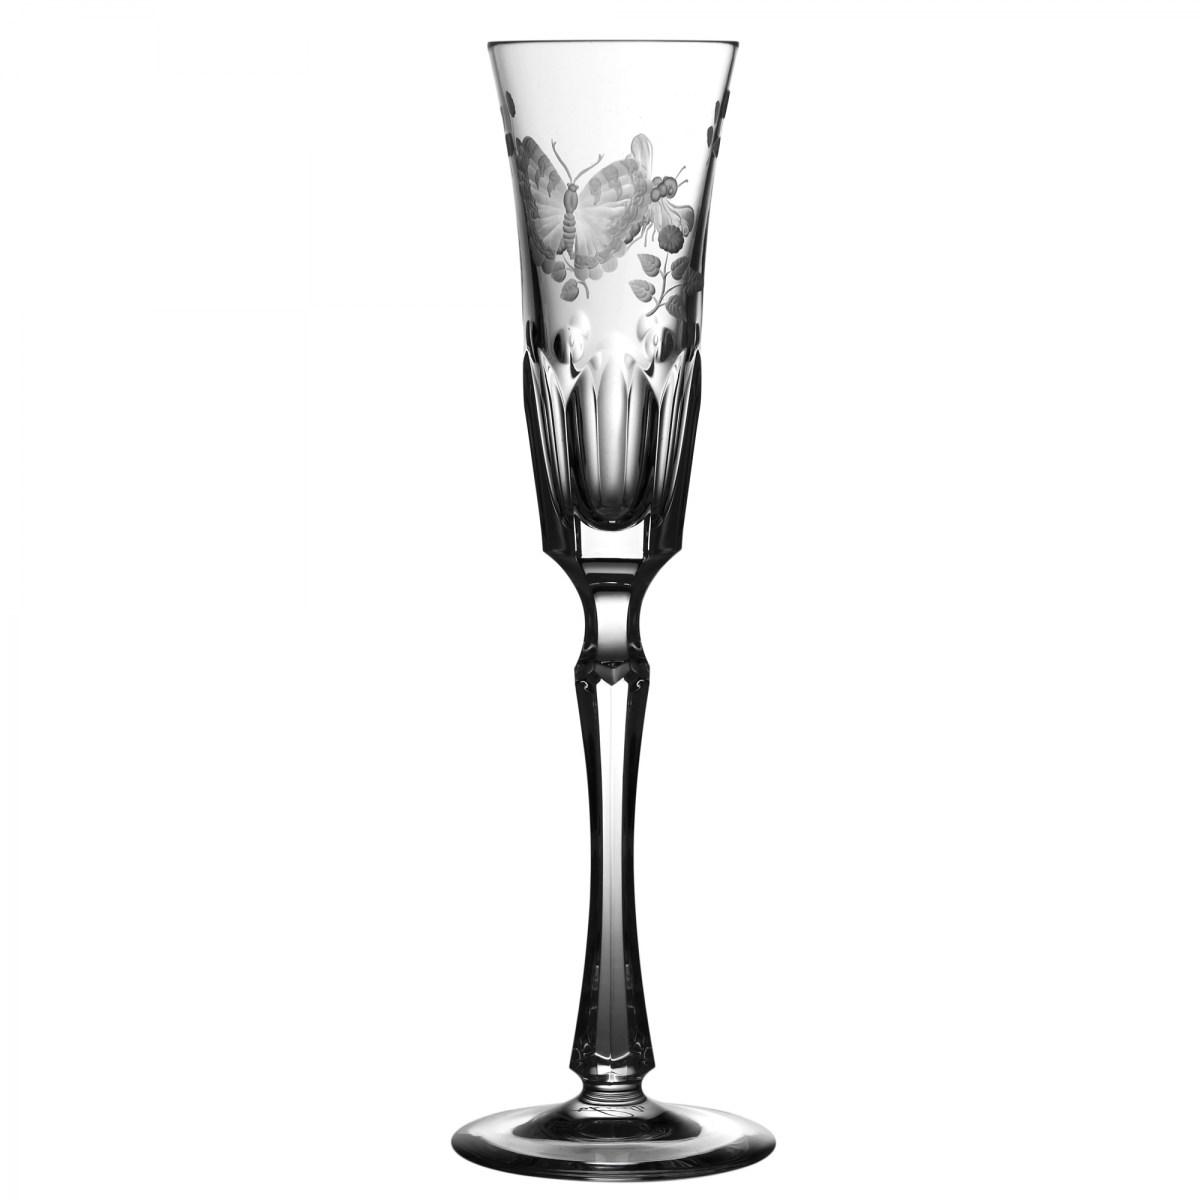 Springtime Clear Flute - $ 203 / € 178